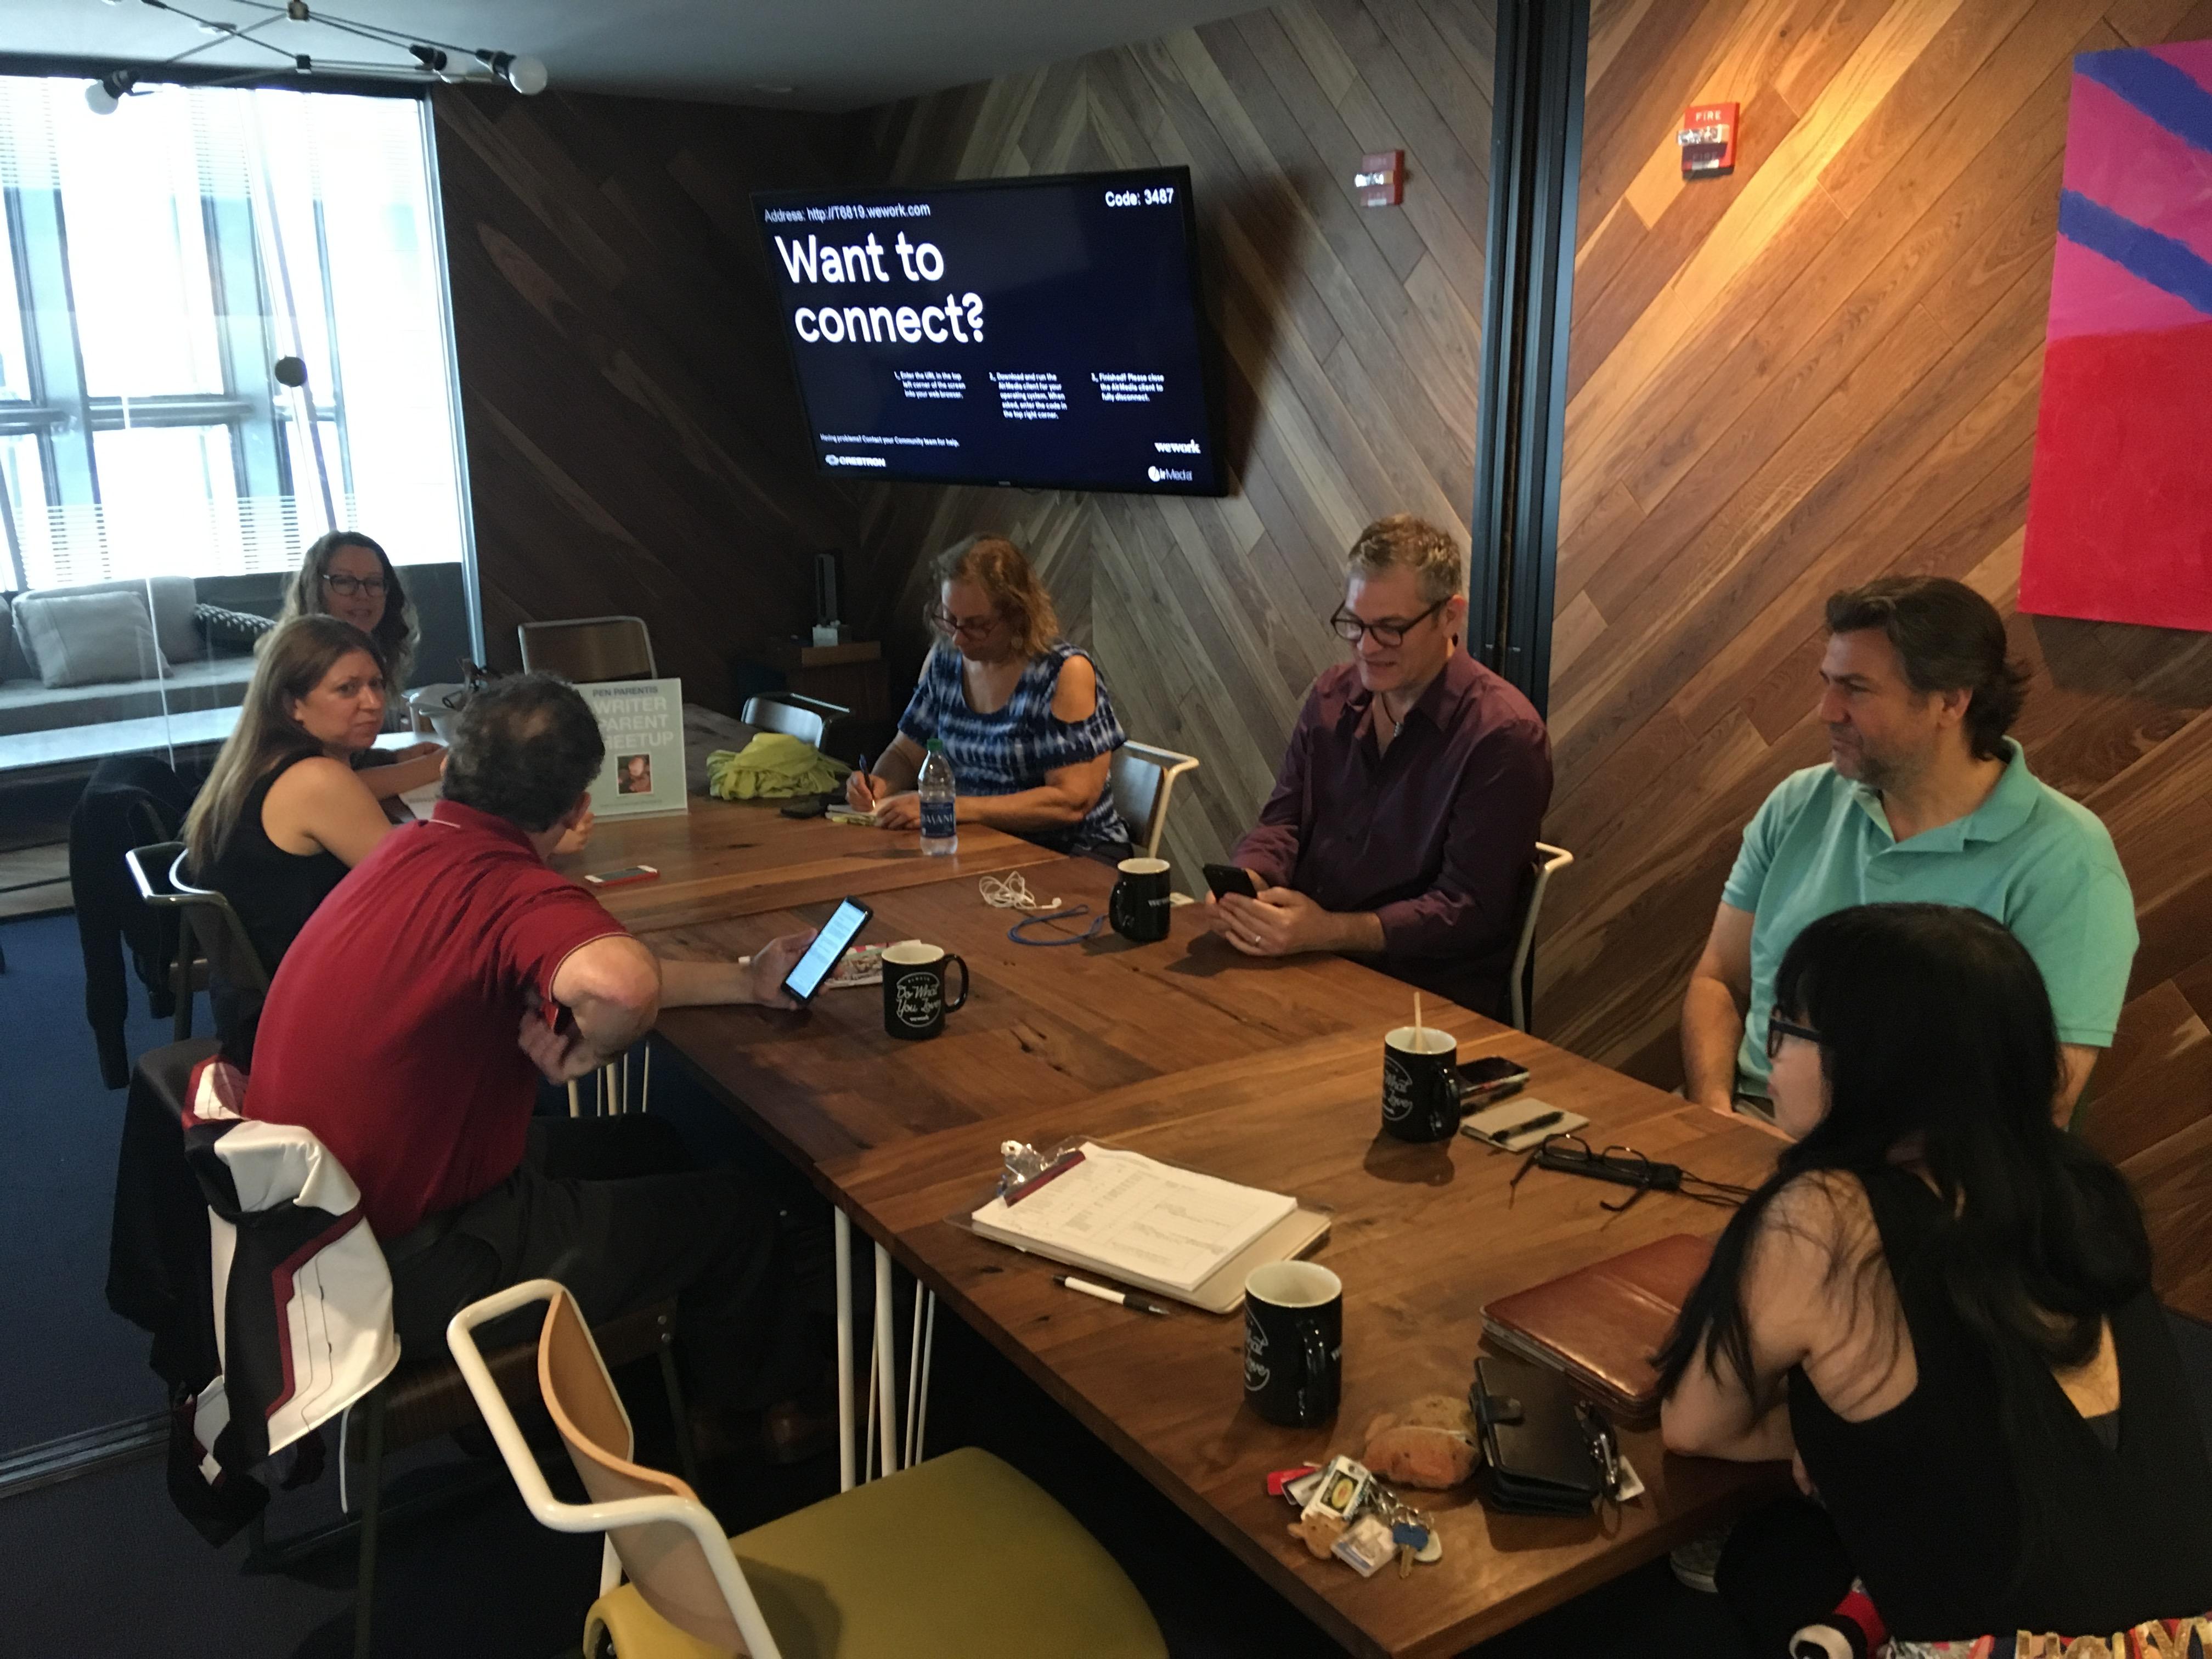 New Brooklyn Meetup Starting on Tuesdays   Pen Parentis